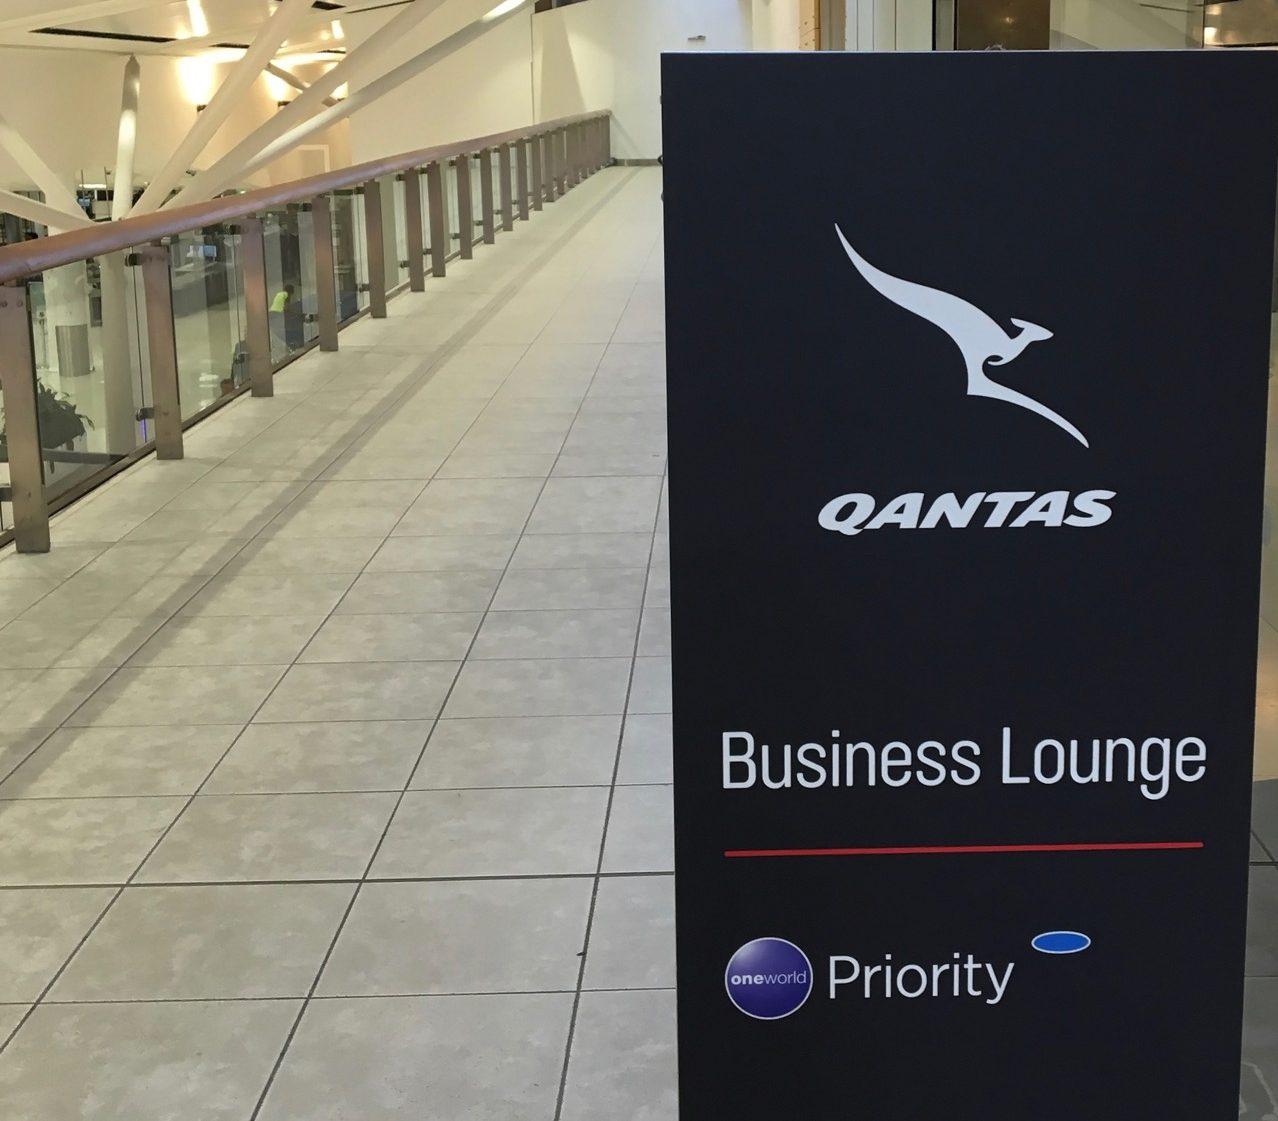 qantas-international-business-lounge-entrance-1